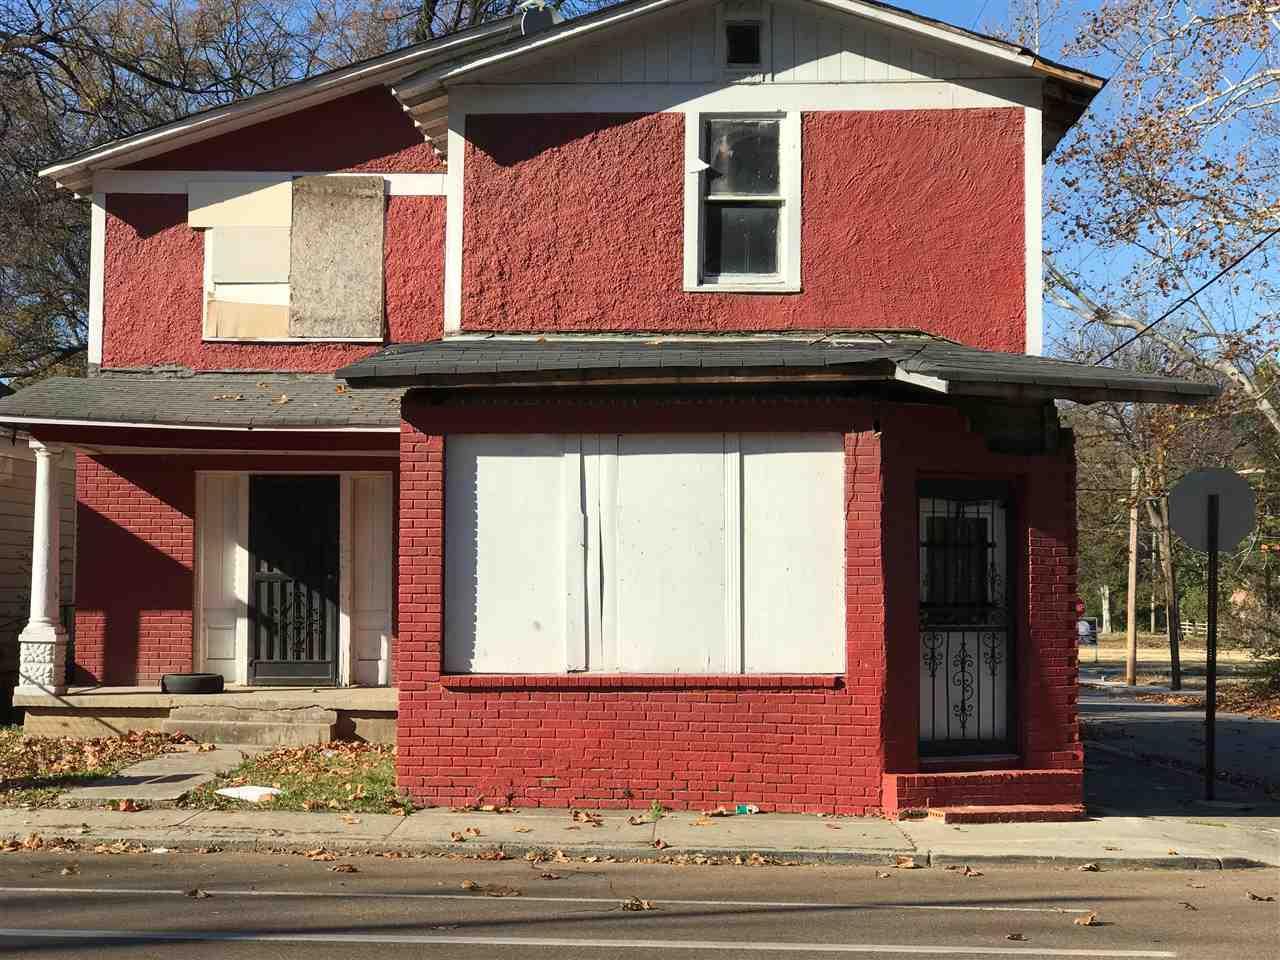 975 S Mclean, Memphis, TN 38114